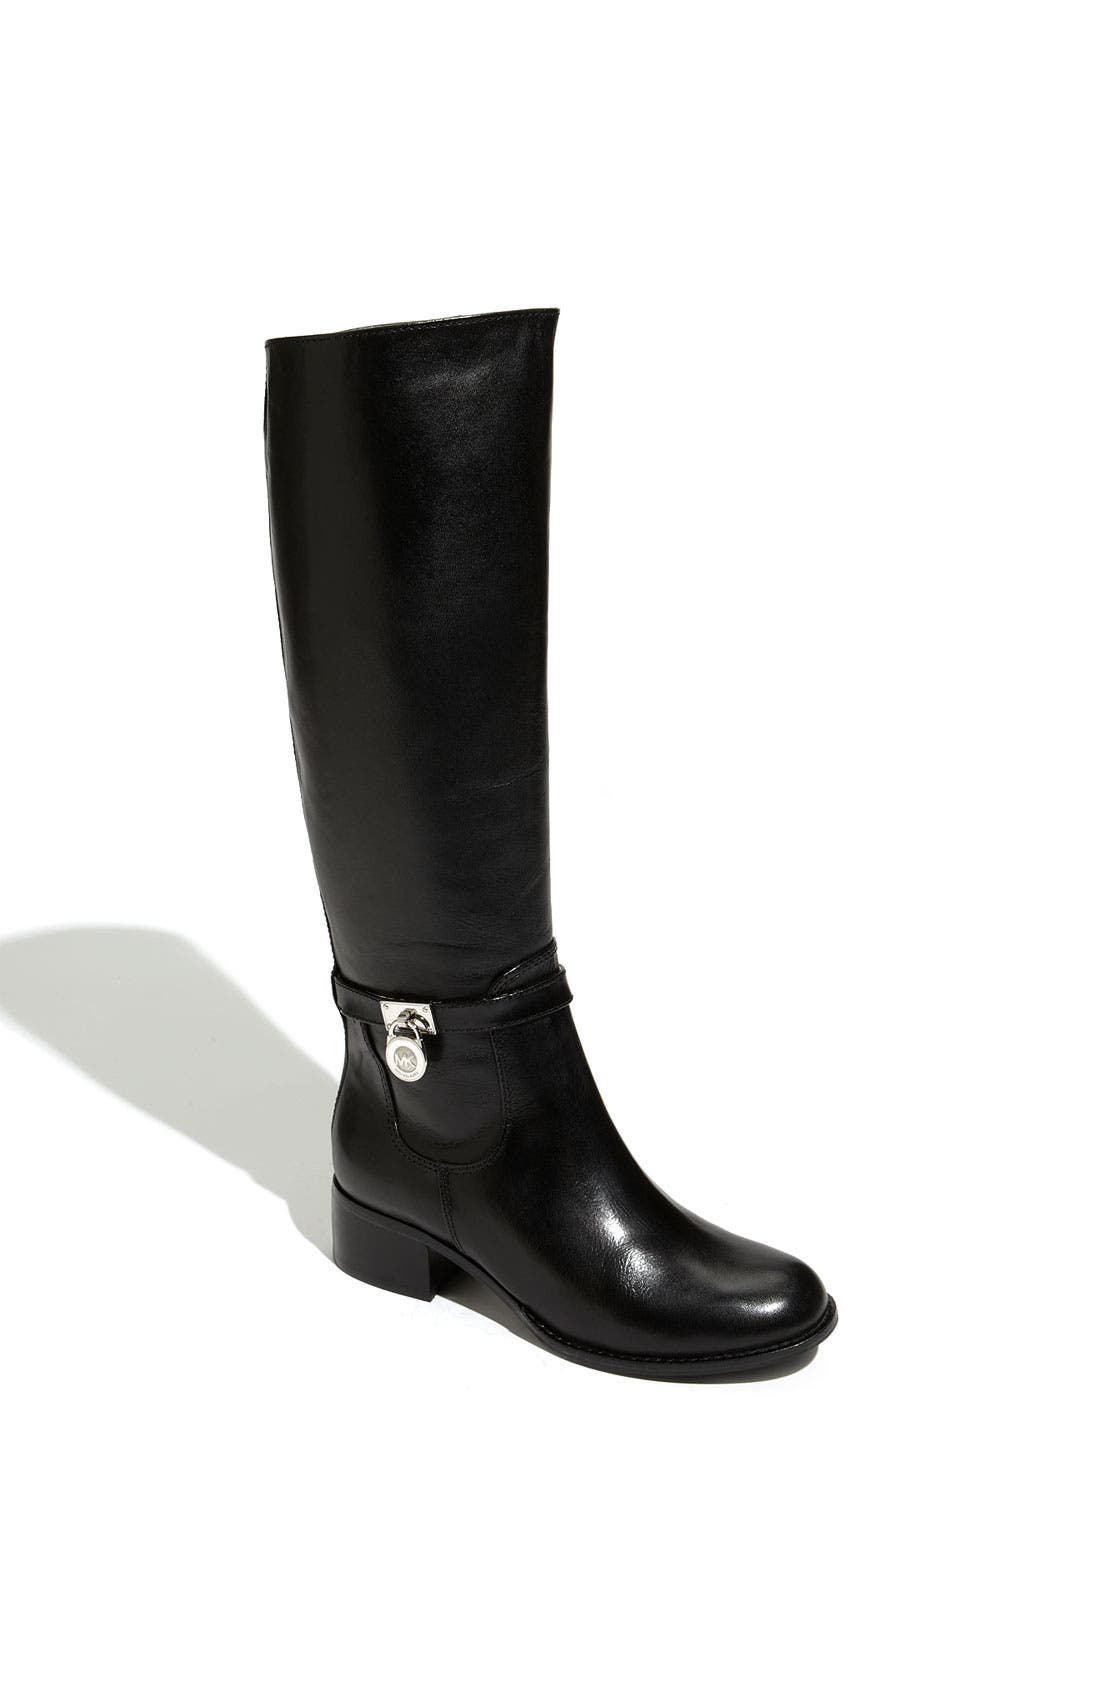 MICHAEL MICHAEL KORS 'Hamilton' Riding Boot, Main, color, 001